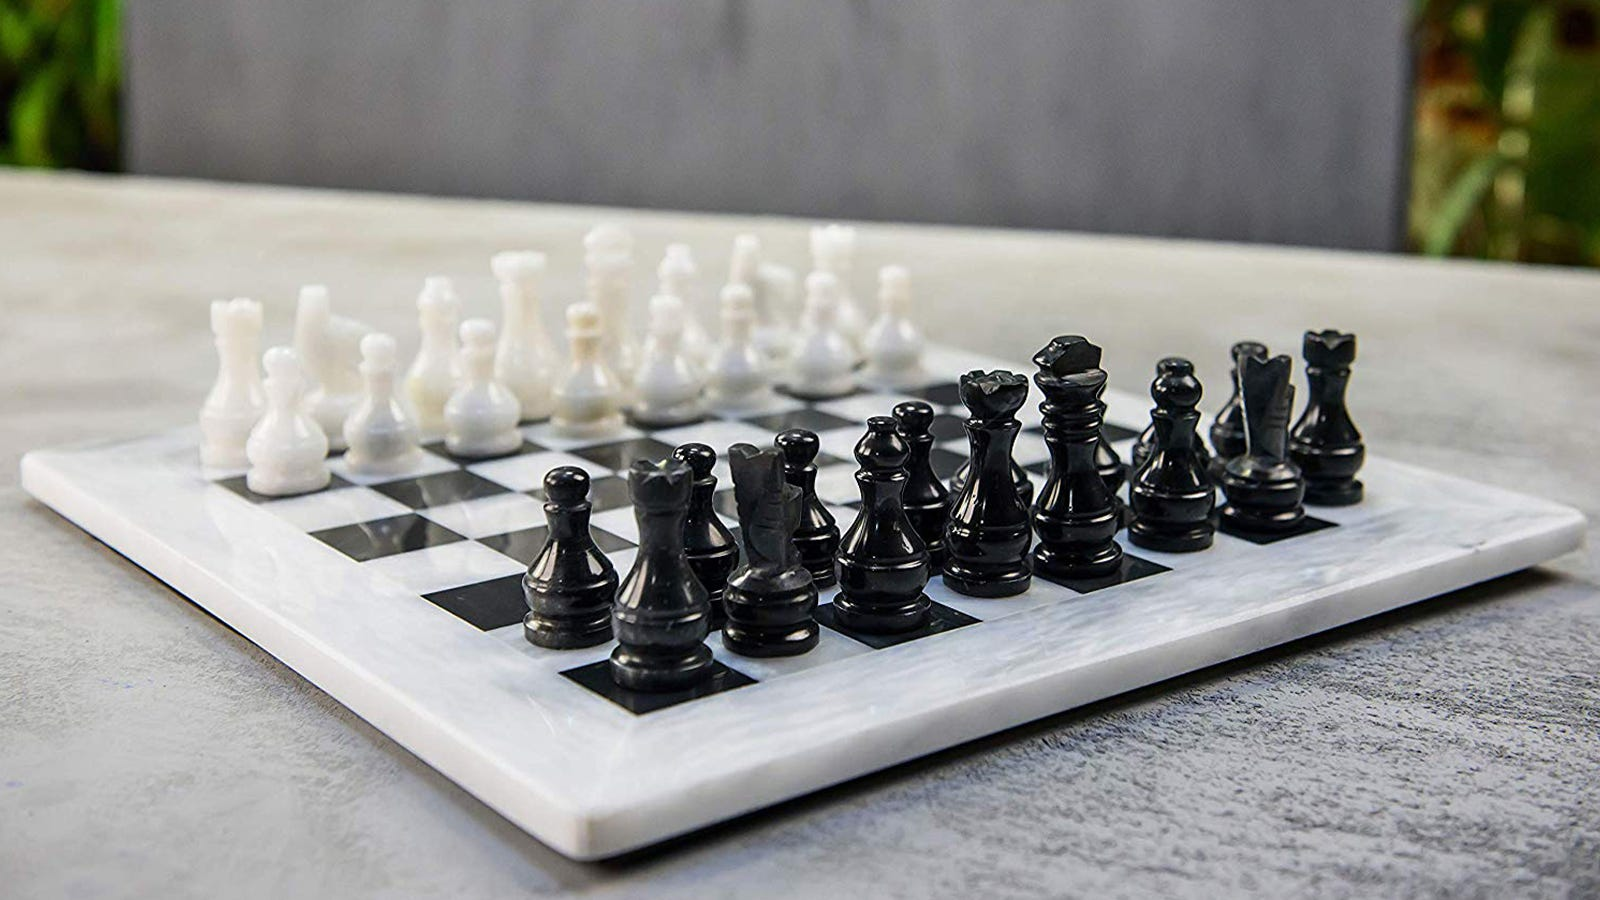 RADICALn Marble Chess Set